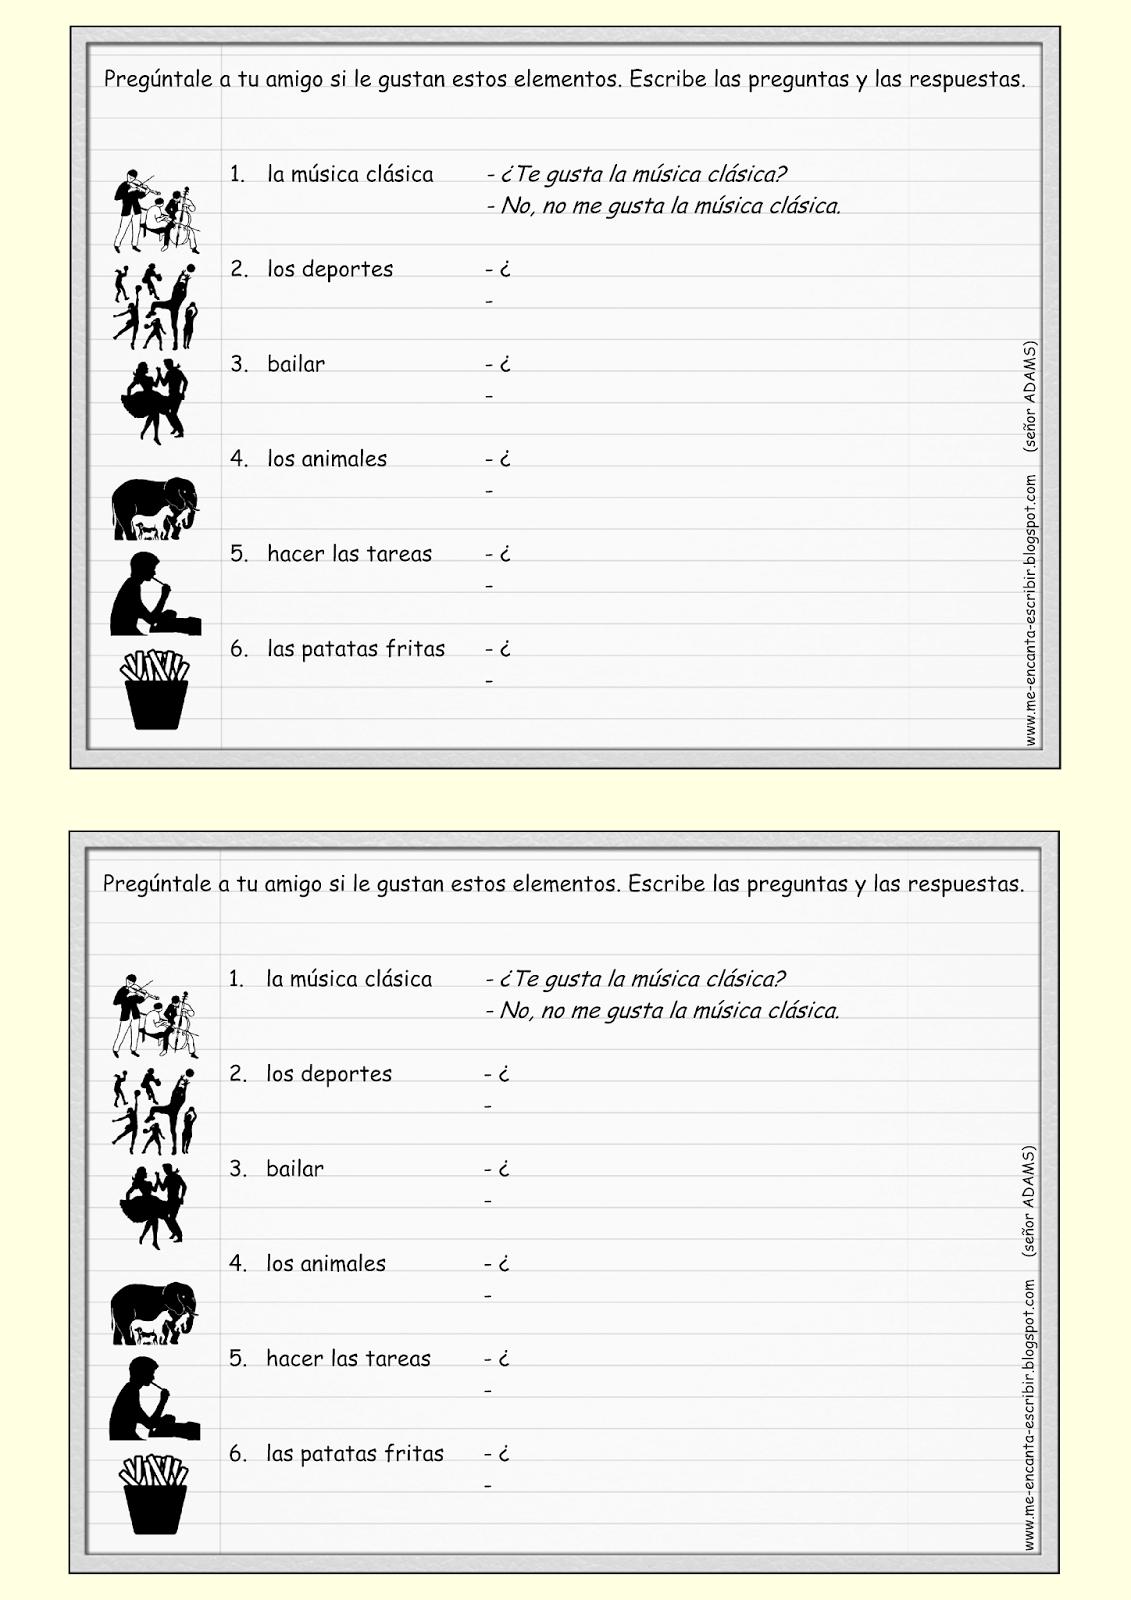 How to write a spanish essay: tips & tricks bestessay4u